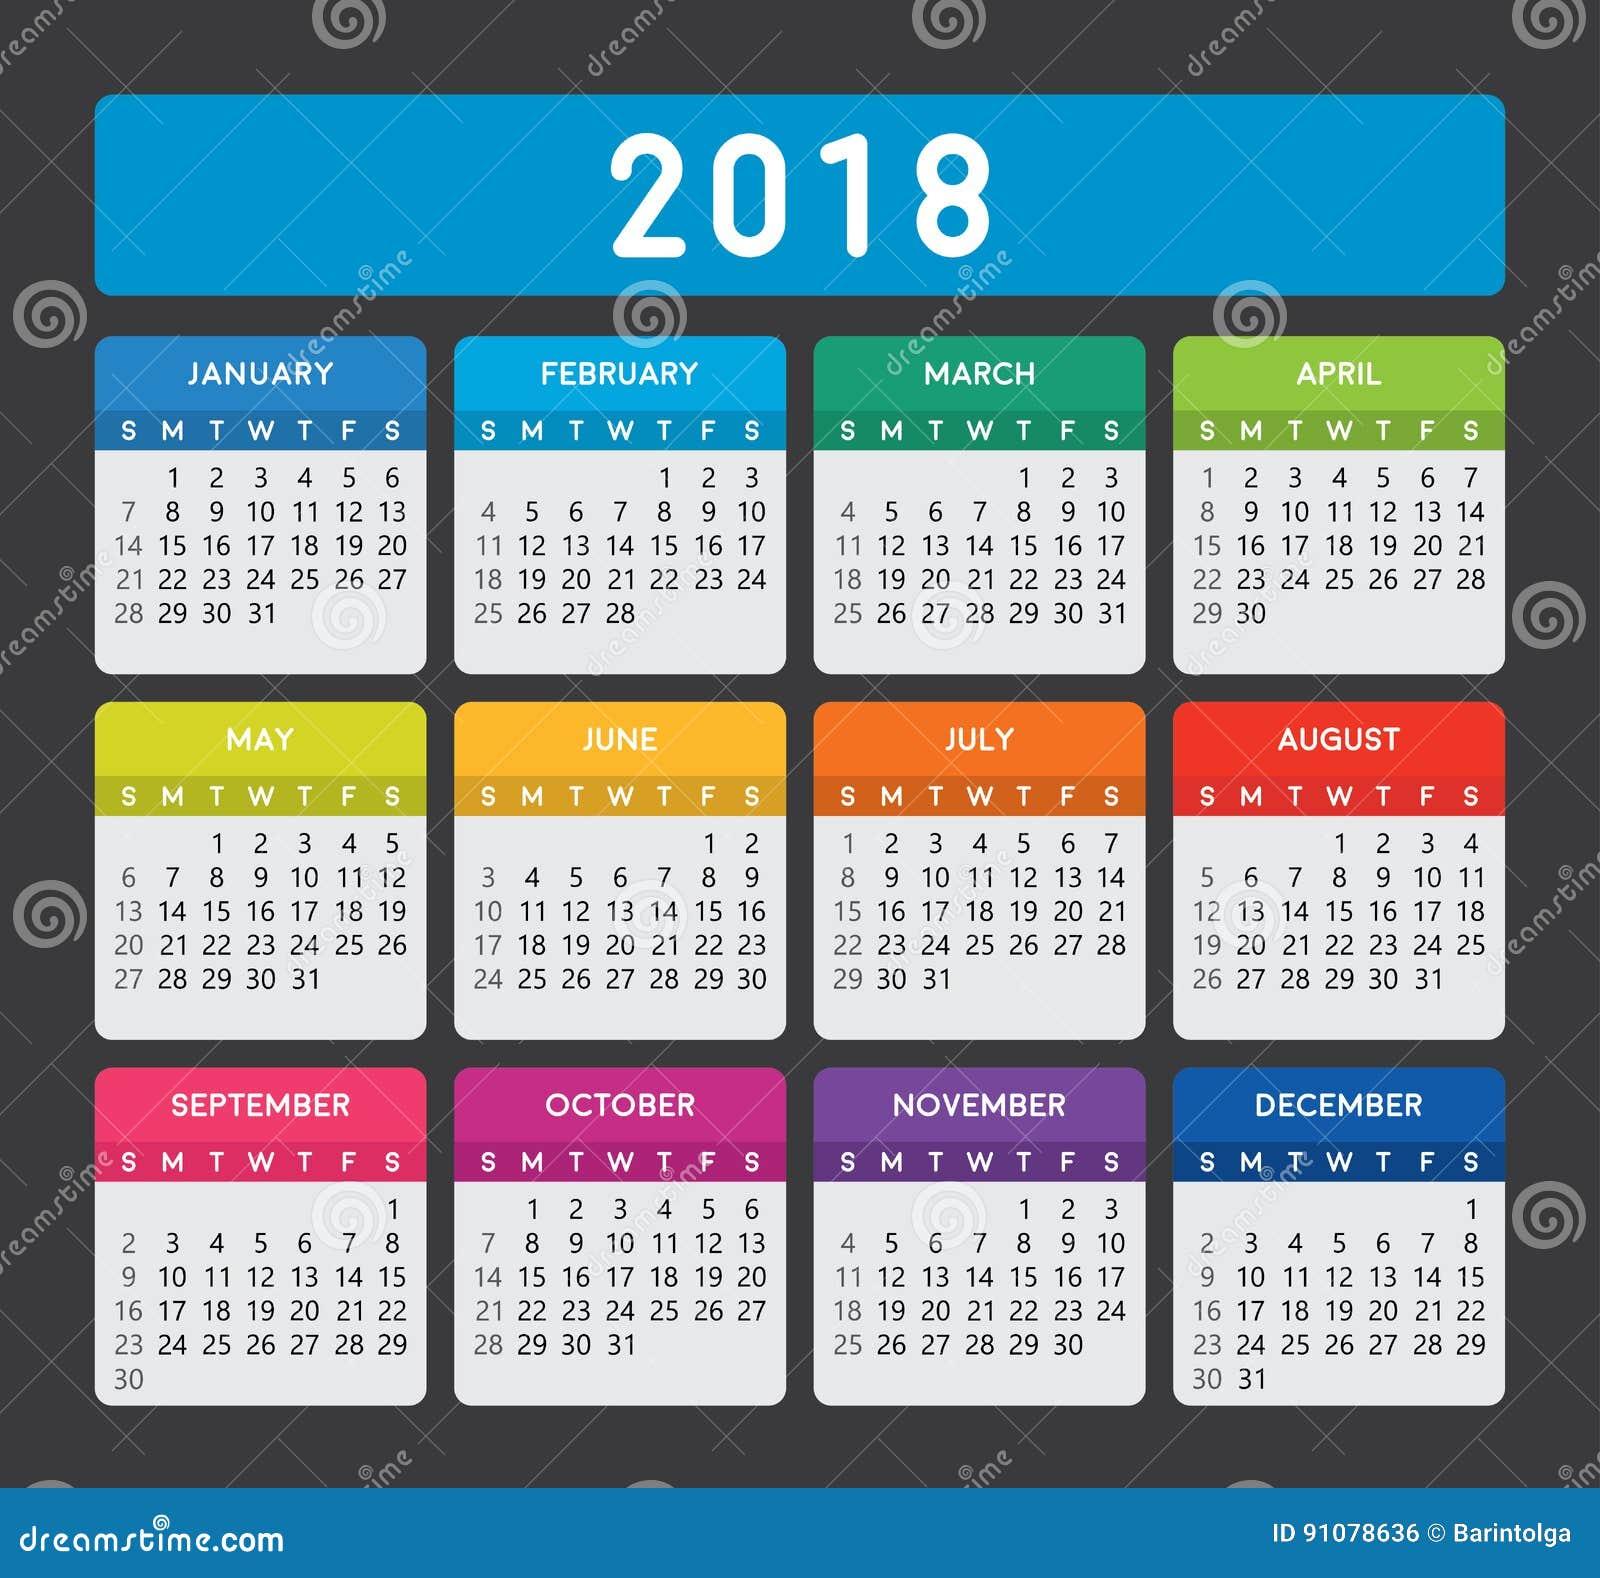 Calendar Typography Template : Colorful calendar on dark background stock vector